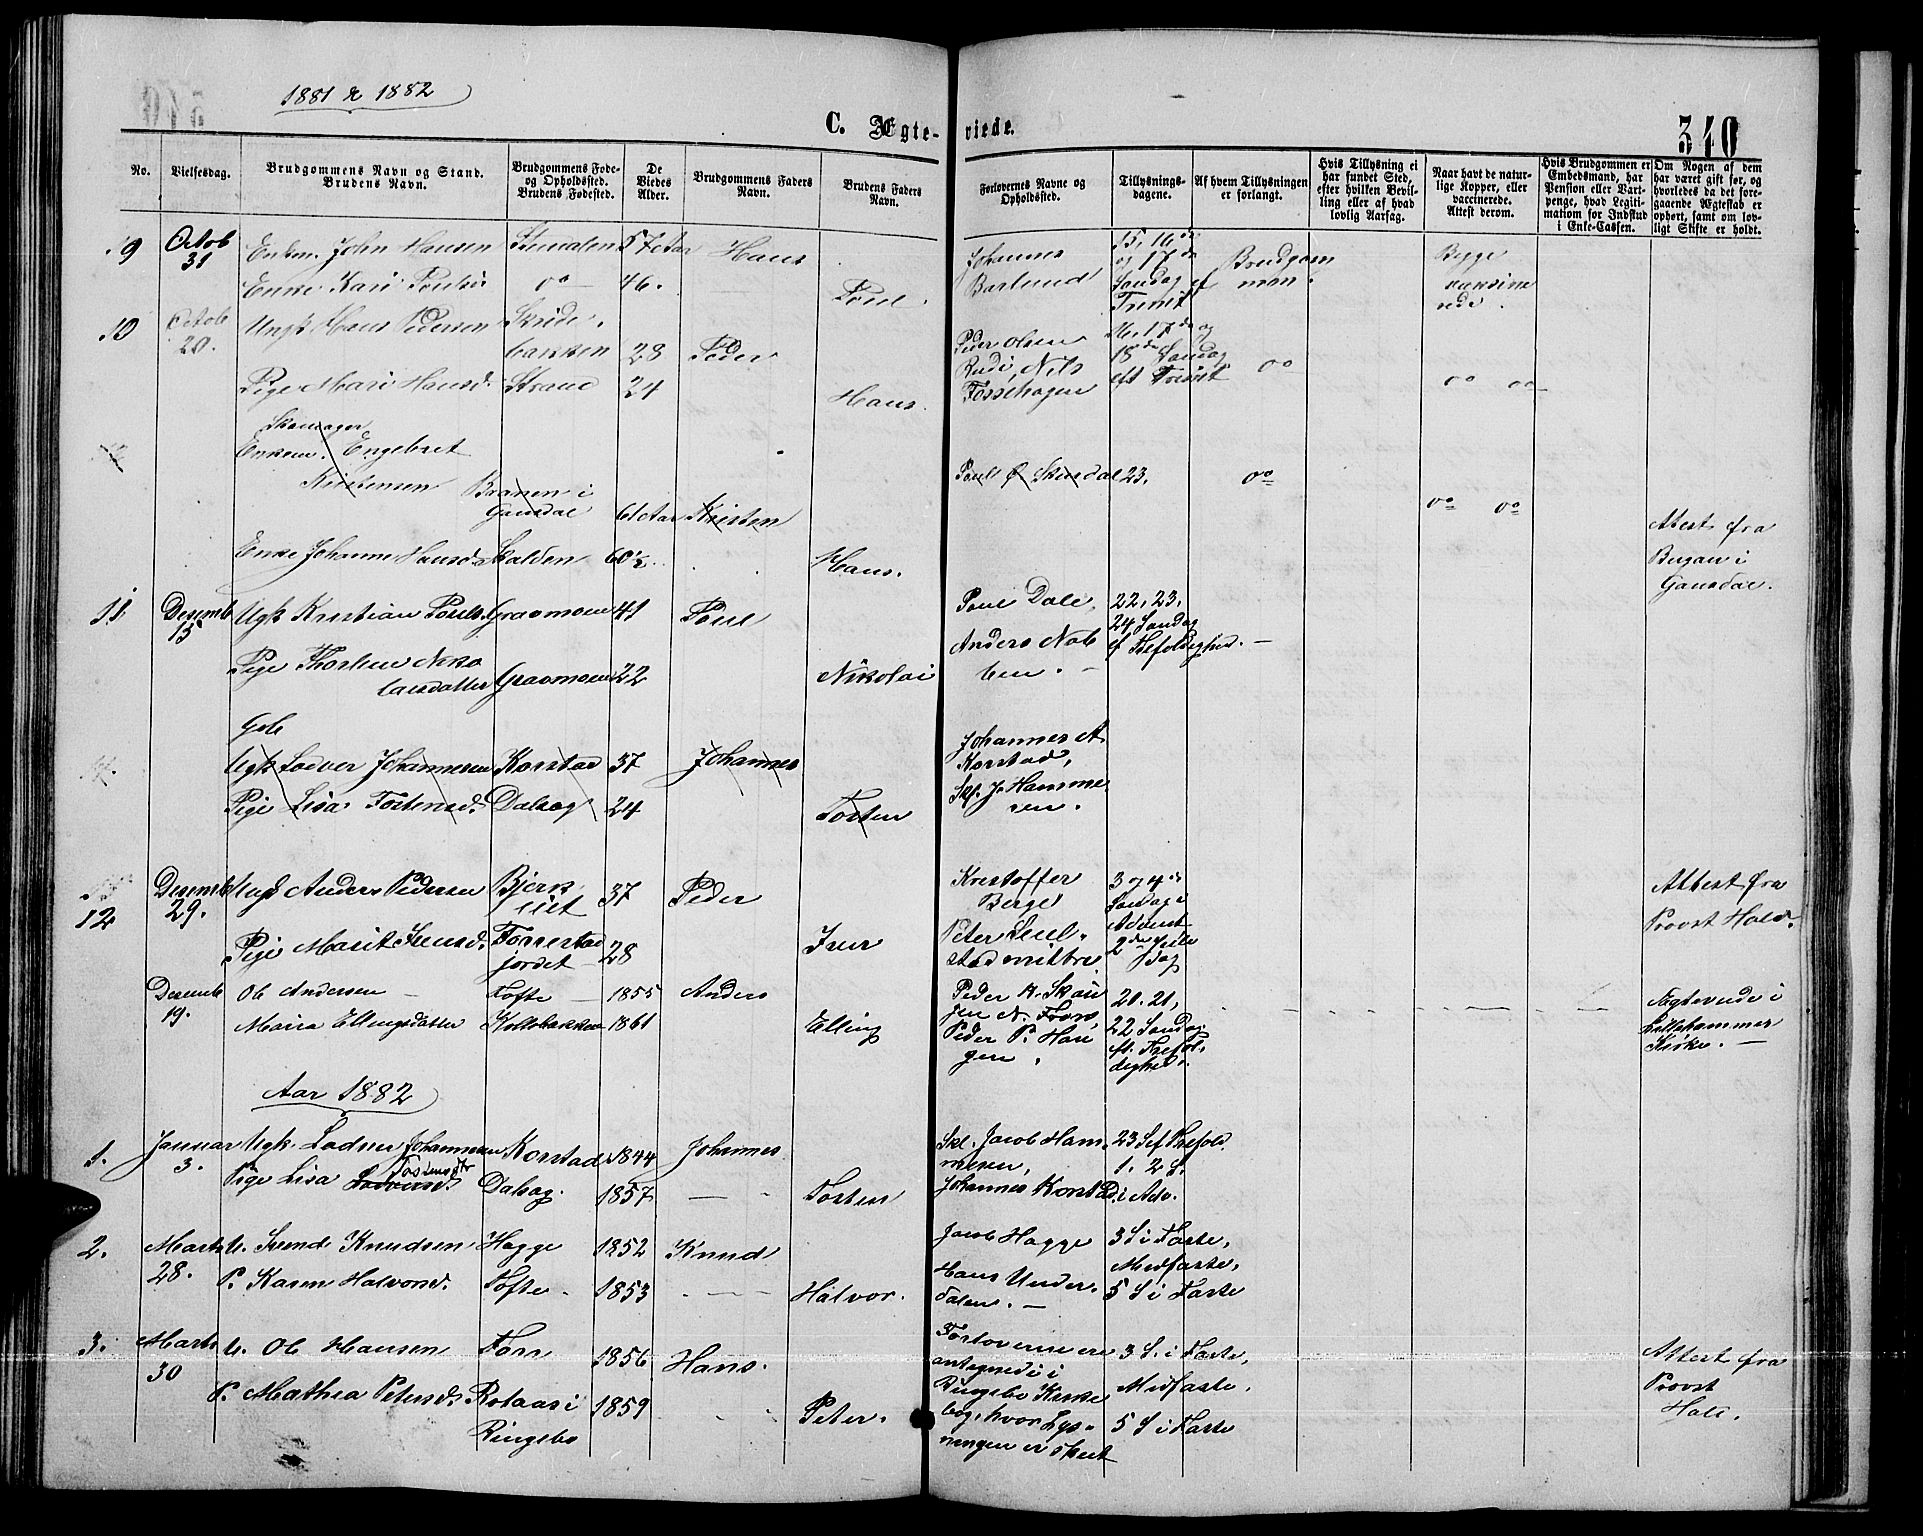 SAH, Sør-Fron prestekontor, H/Ha/Hab/L0002: Klokkerbok nr. 2, 1864-1883, s. 340